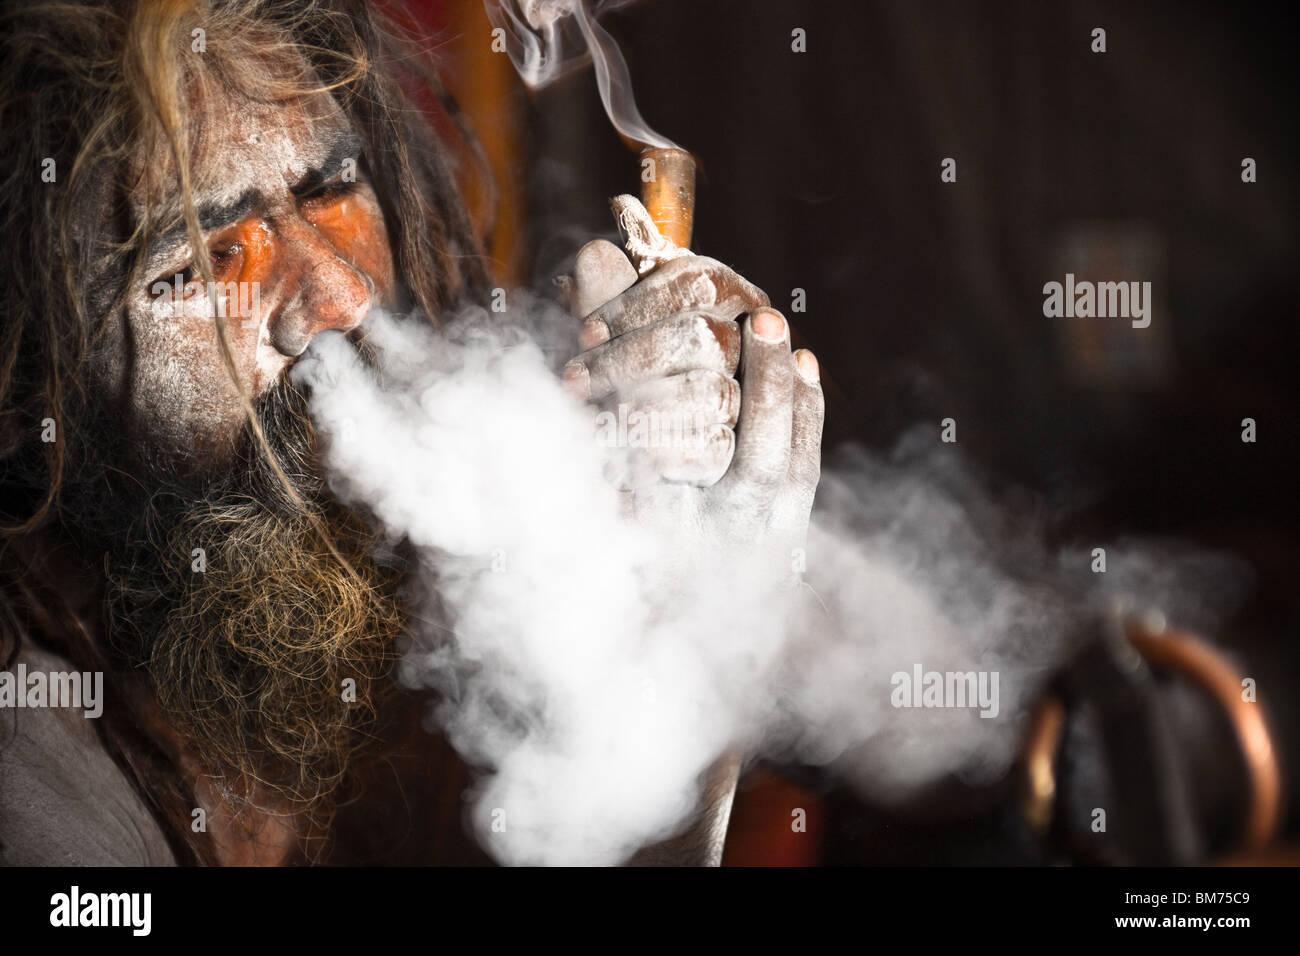 Naga Sadus during the Haridwar Kumbh mela 2010. India Stock Photo